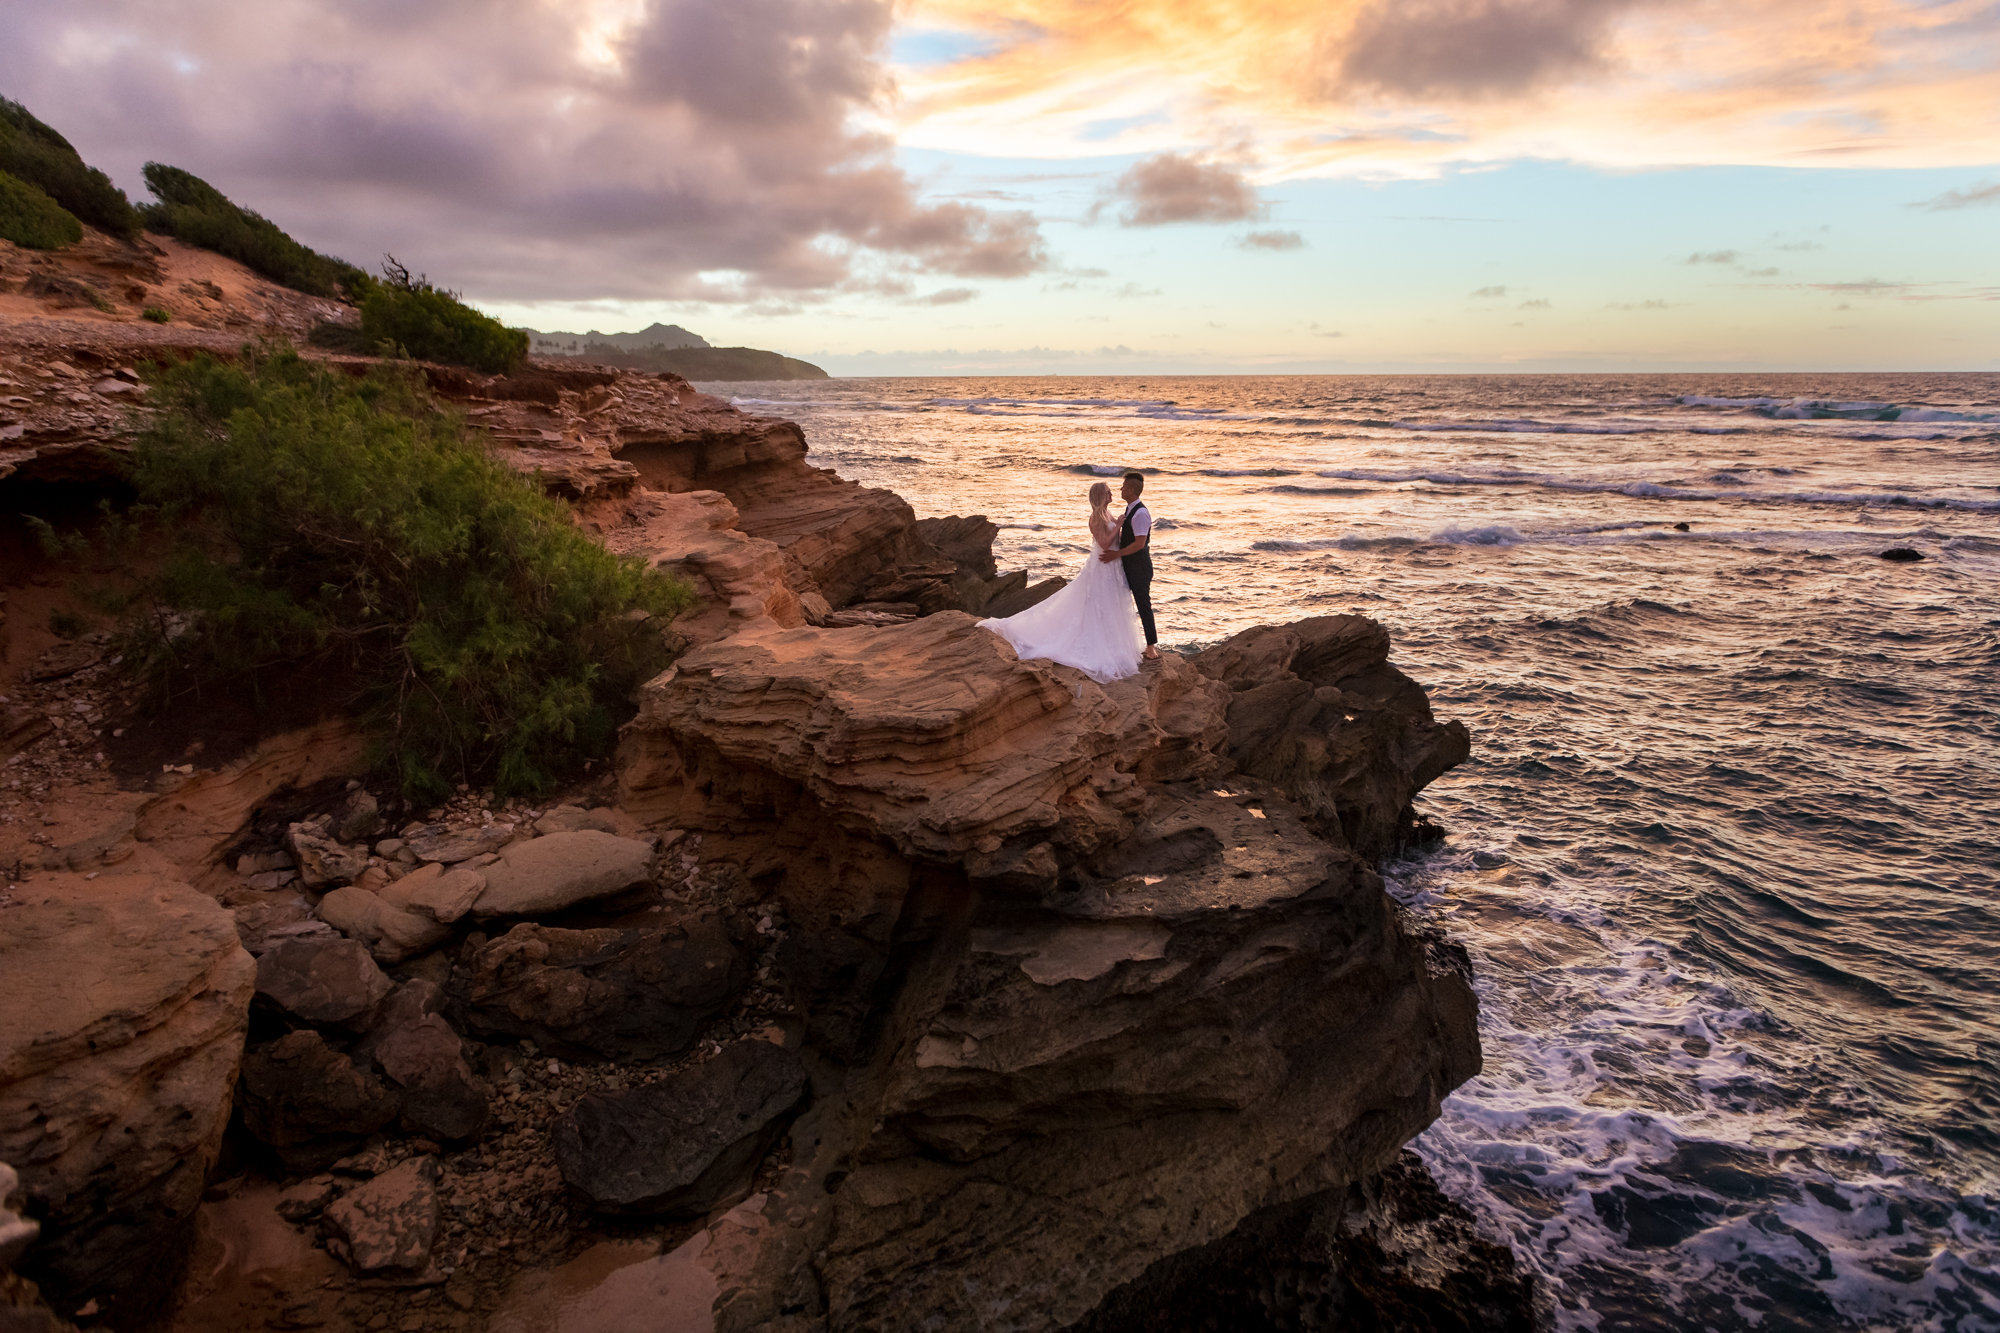 sunrise-wedding-coleen-shipwrecks-6-29-2919-8966.jpg